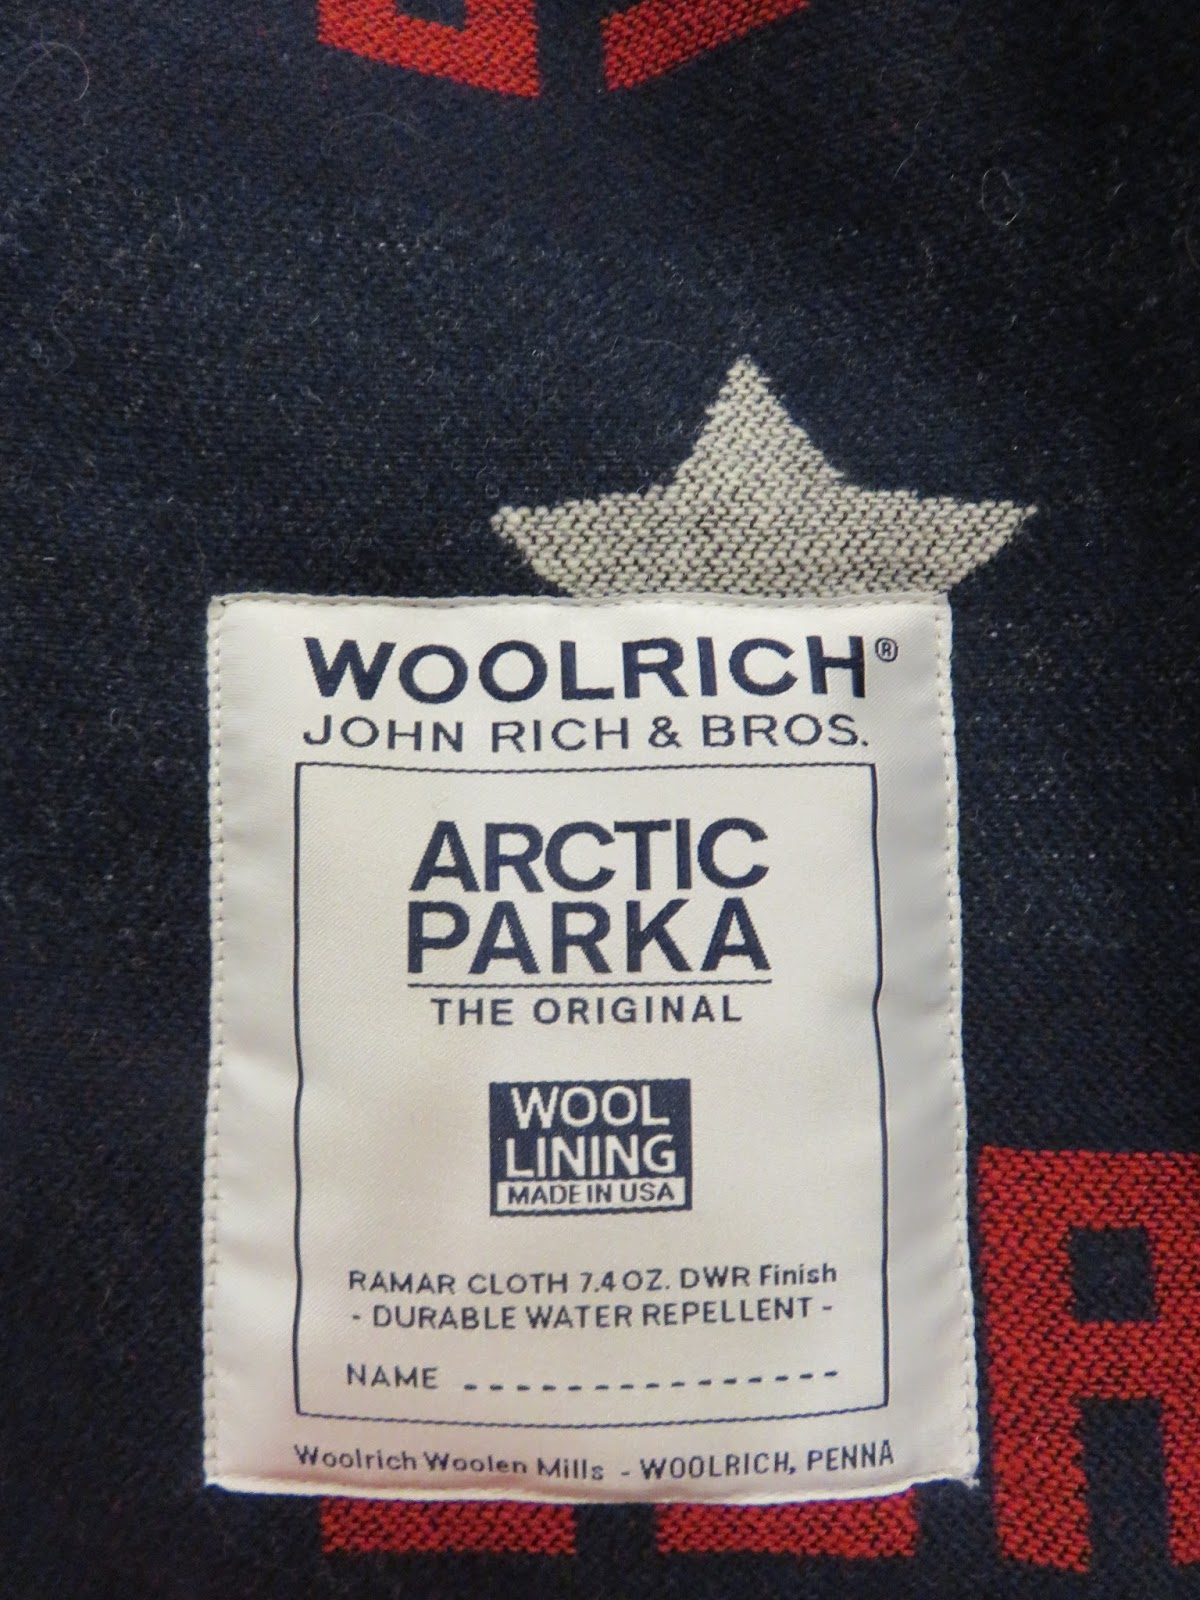 woolrich arctic parka vs canada goose